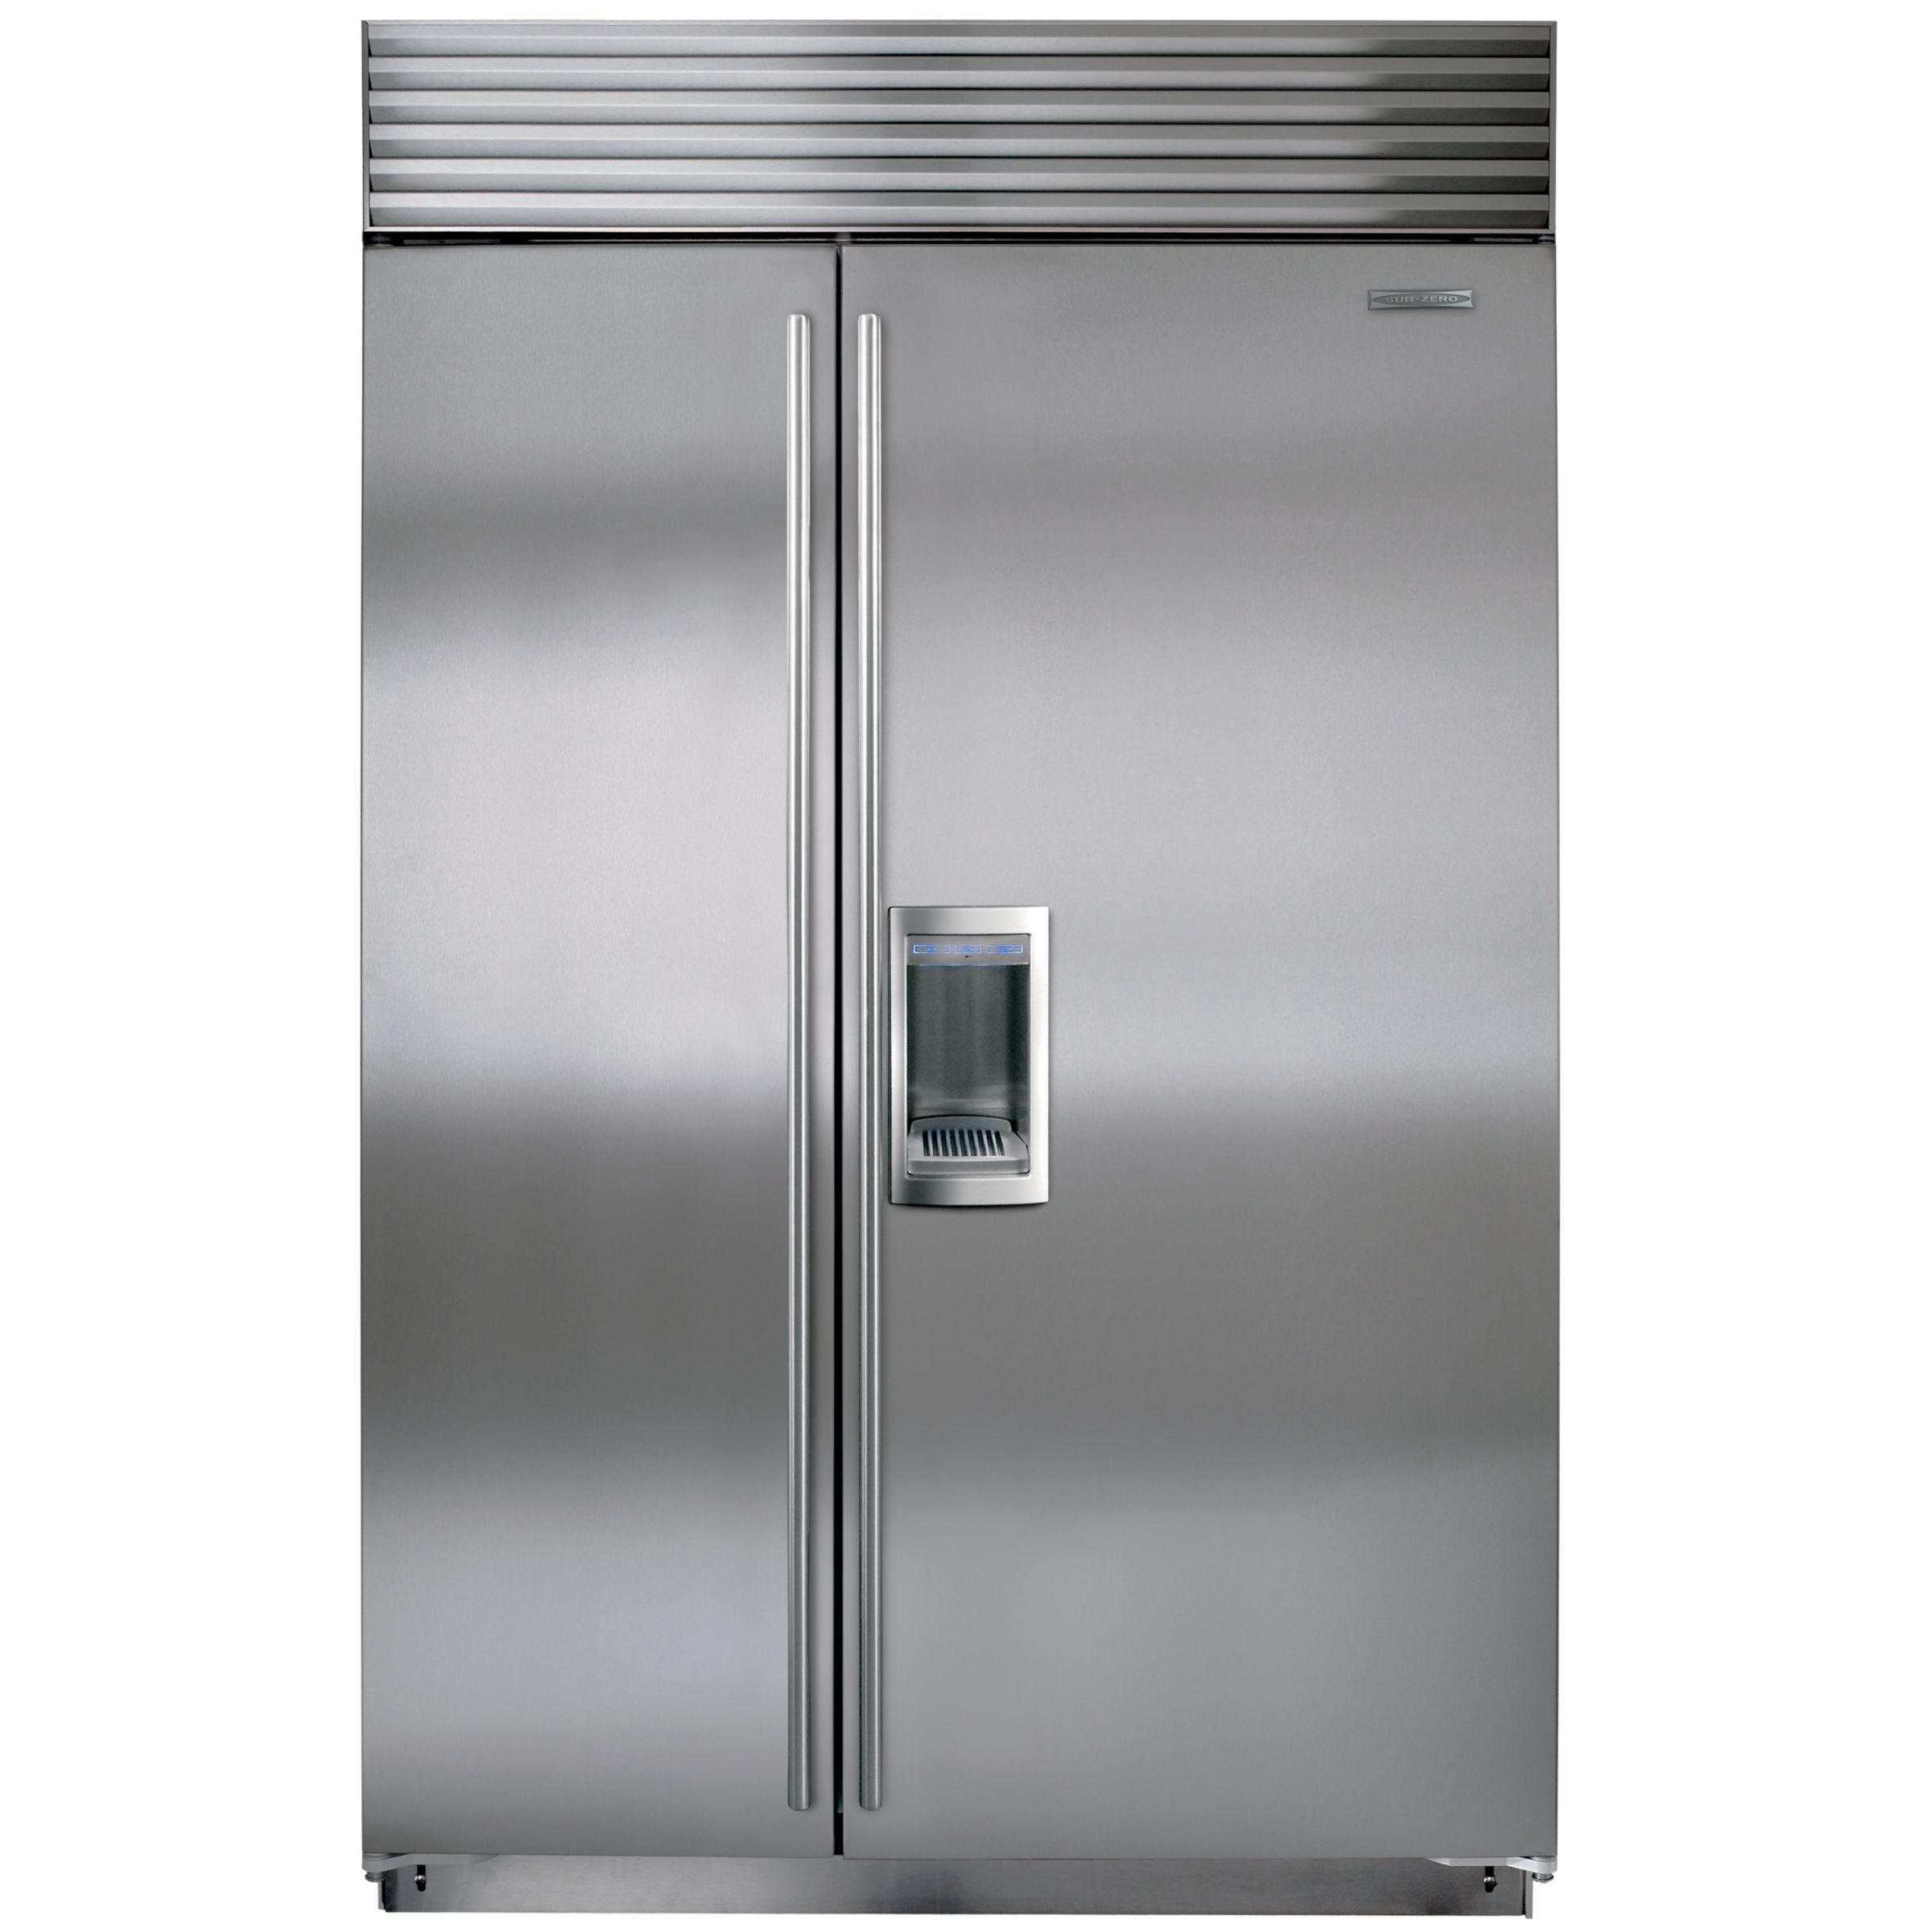 Sub-Zero Sub-Zero ICBBI48SD/S/TH Integrated Side by Side Fridge Freezer, Stainless Steel